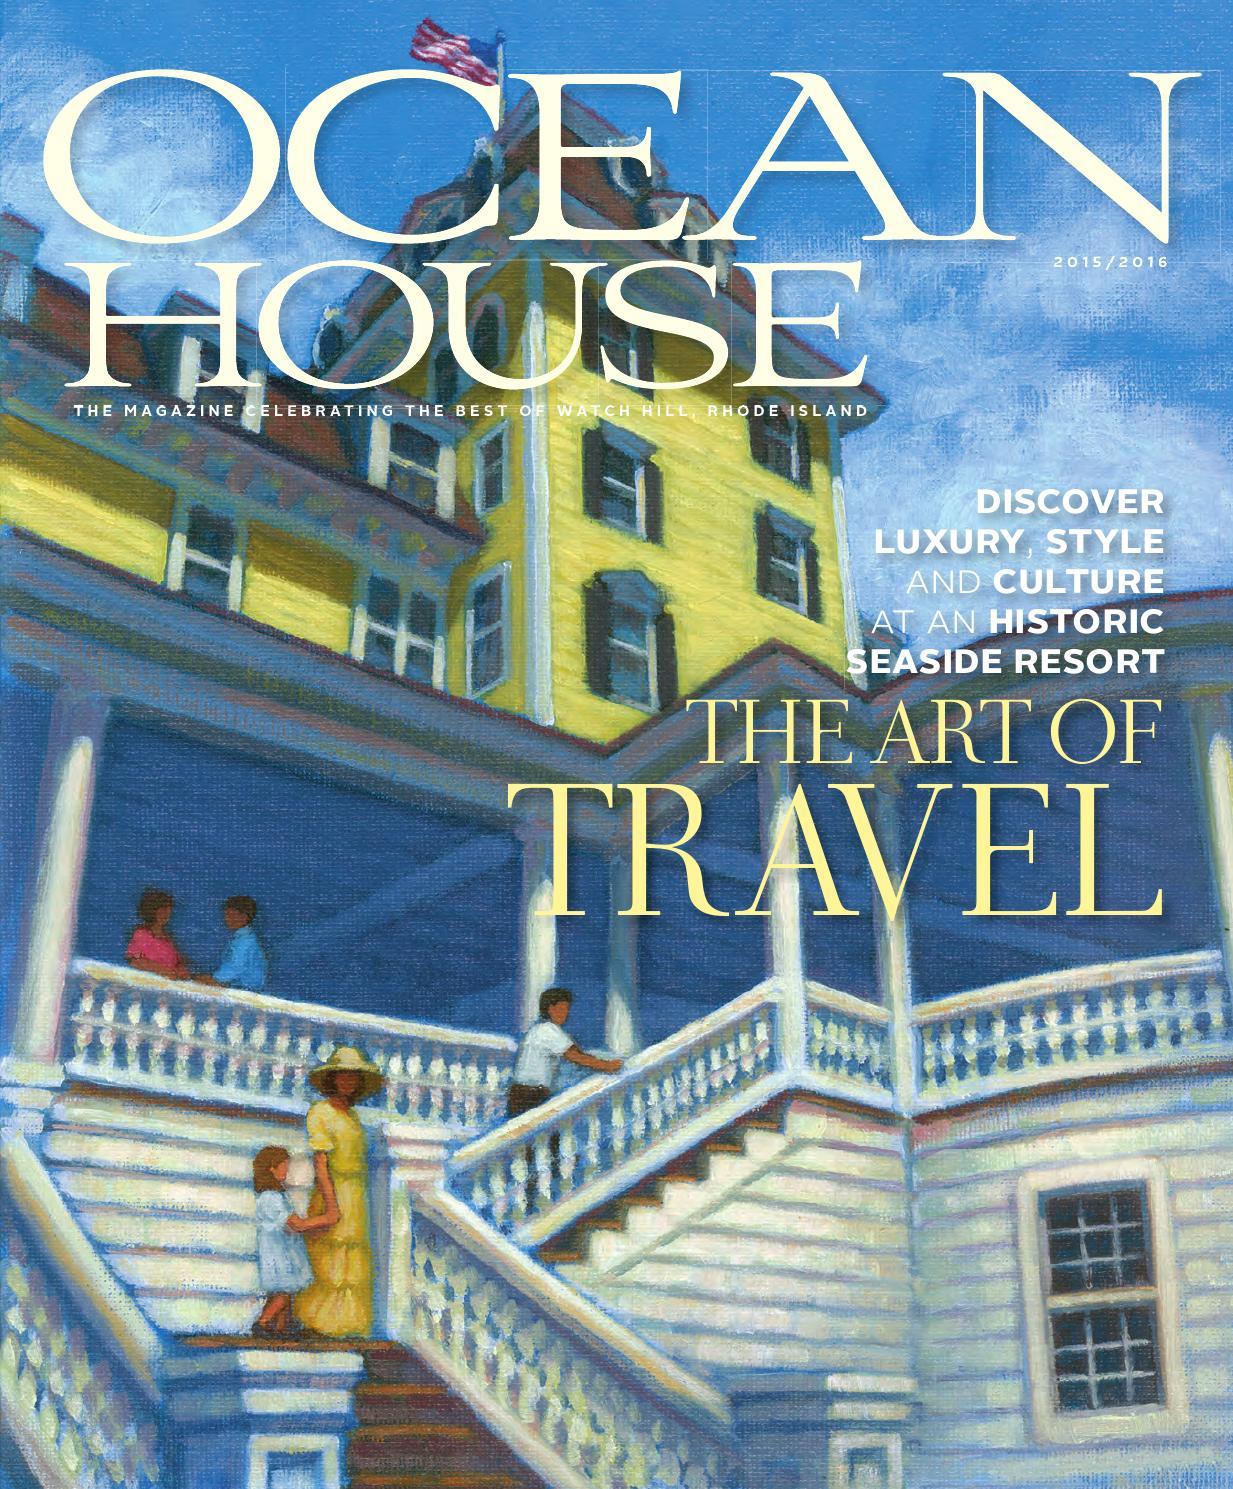 Ocean House Magazine 2015/2016 By OceanHouseRI